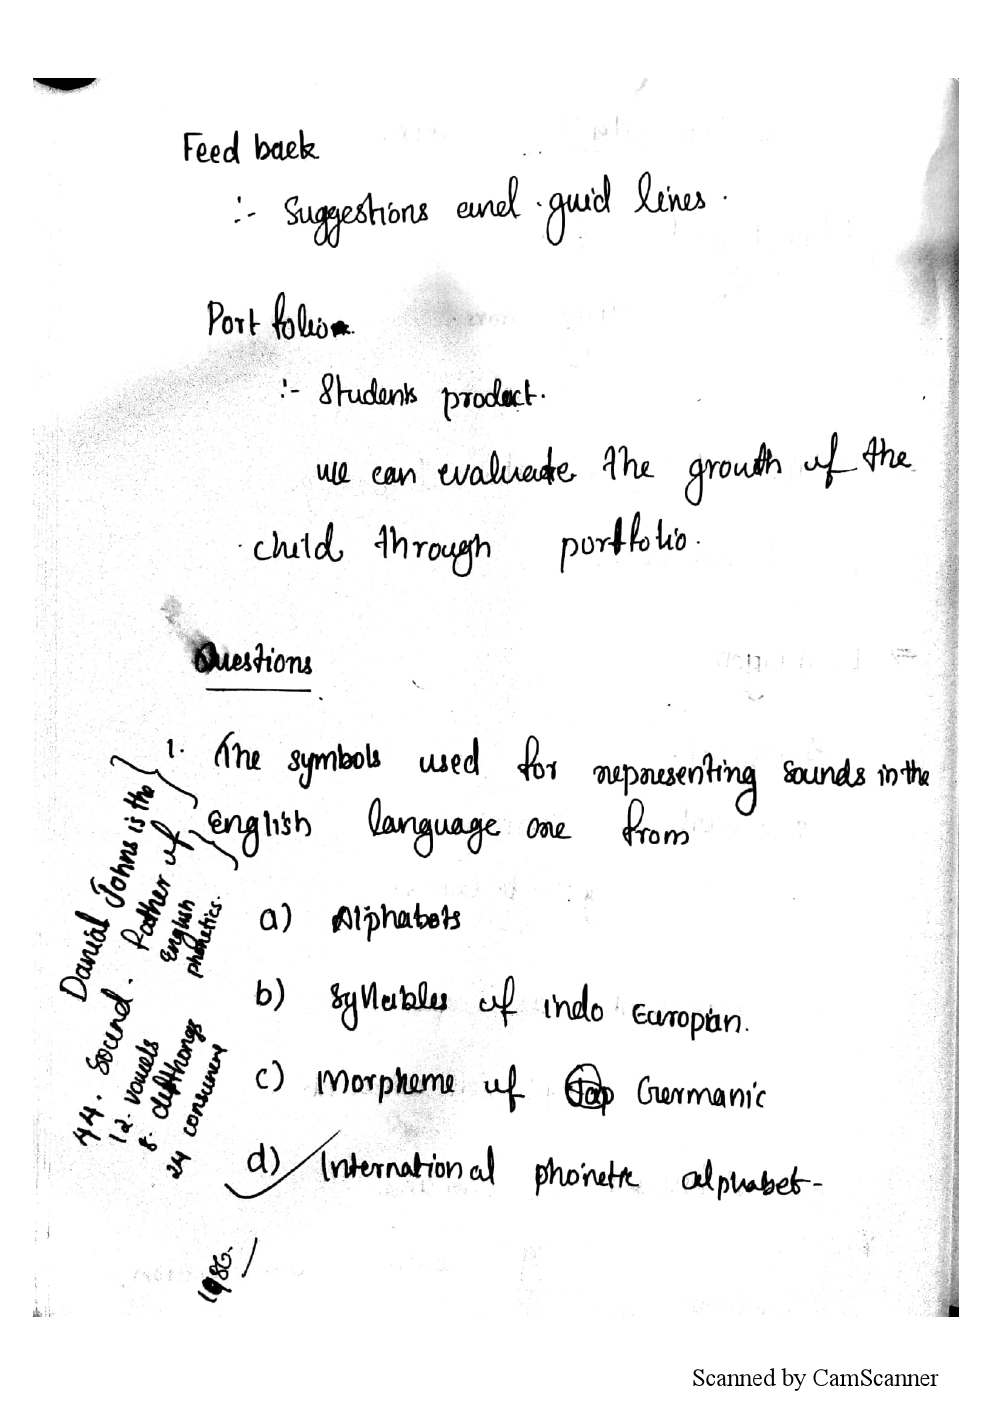 http://masterstudy.net/pdf/ktet_notes0069.png